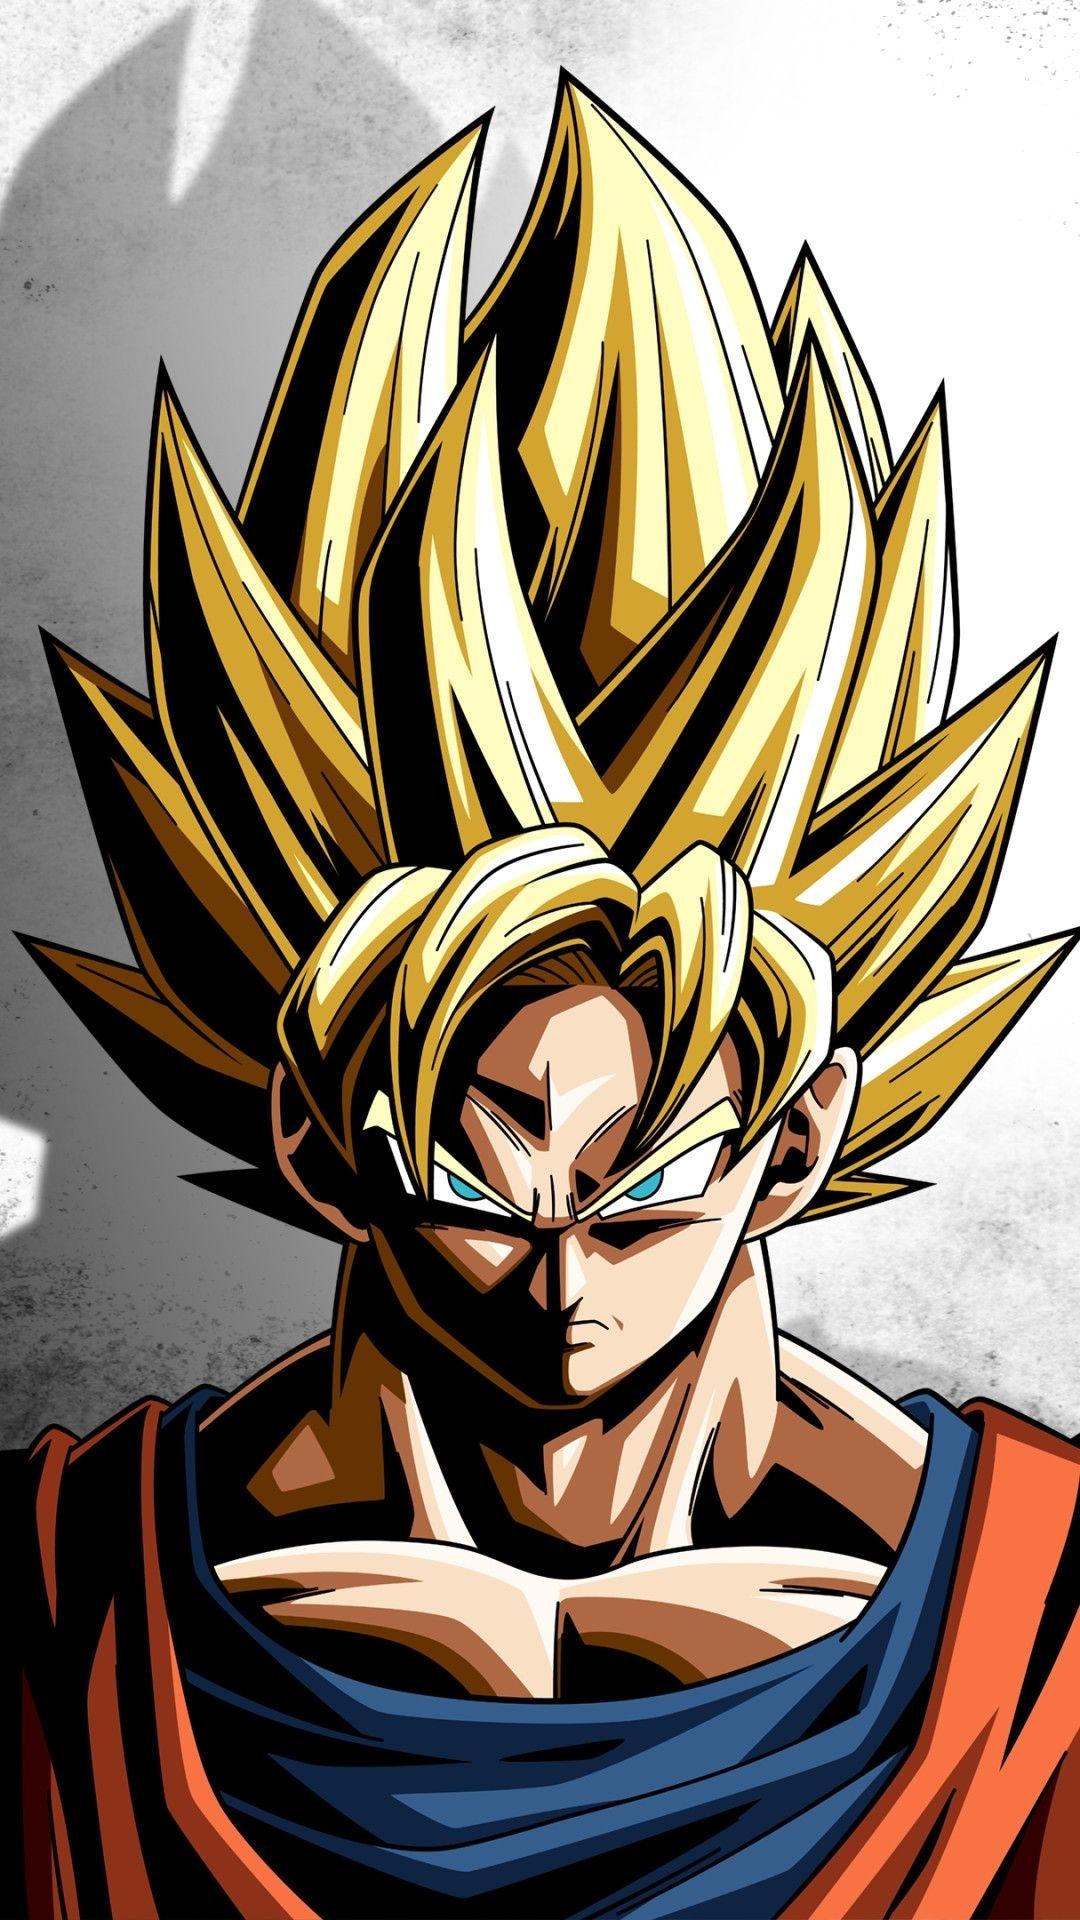 dragon ball z | anime iphone wallpapers | dbz | pinterest | sangoku